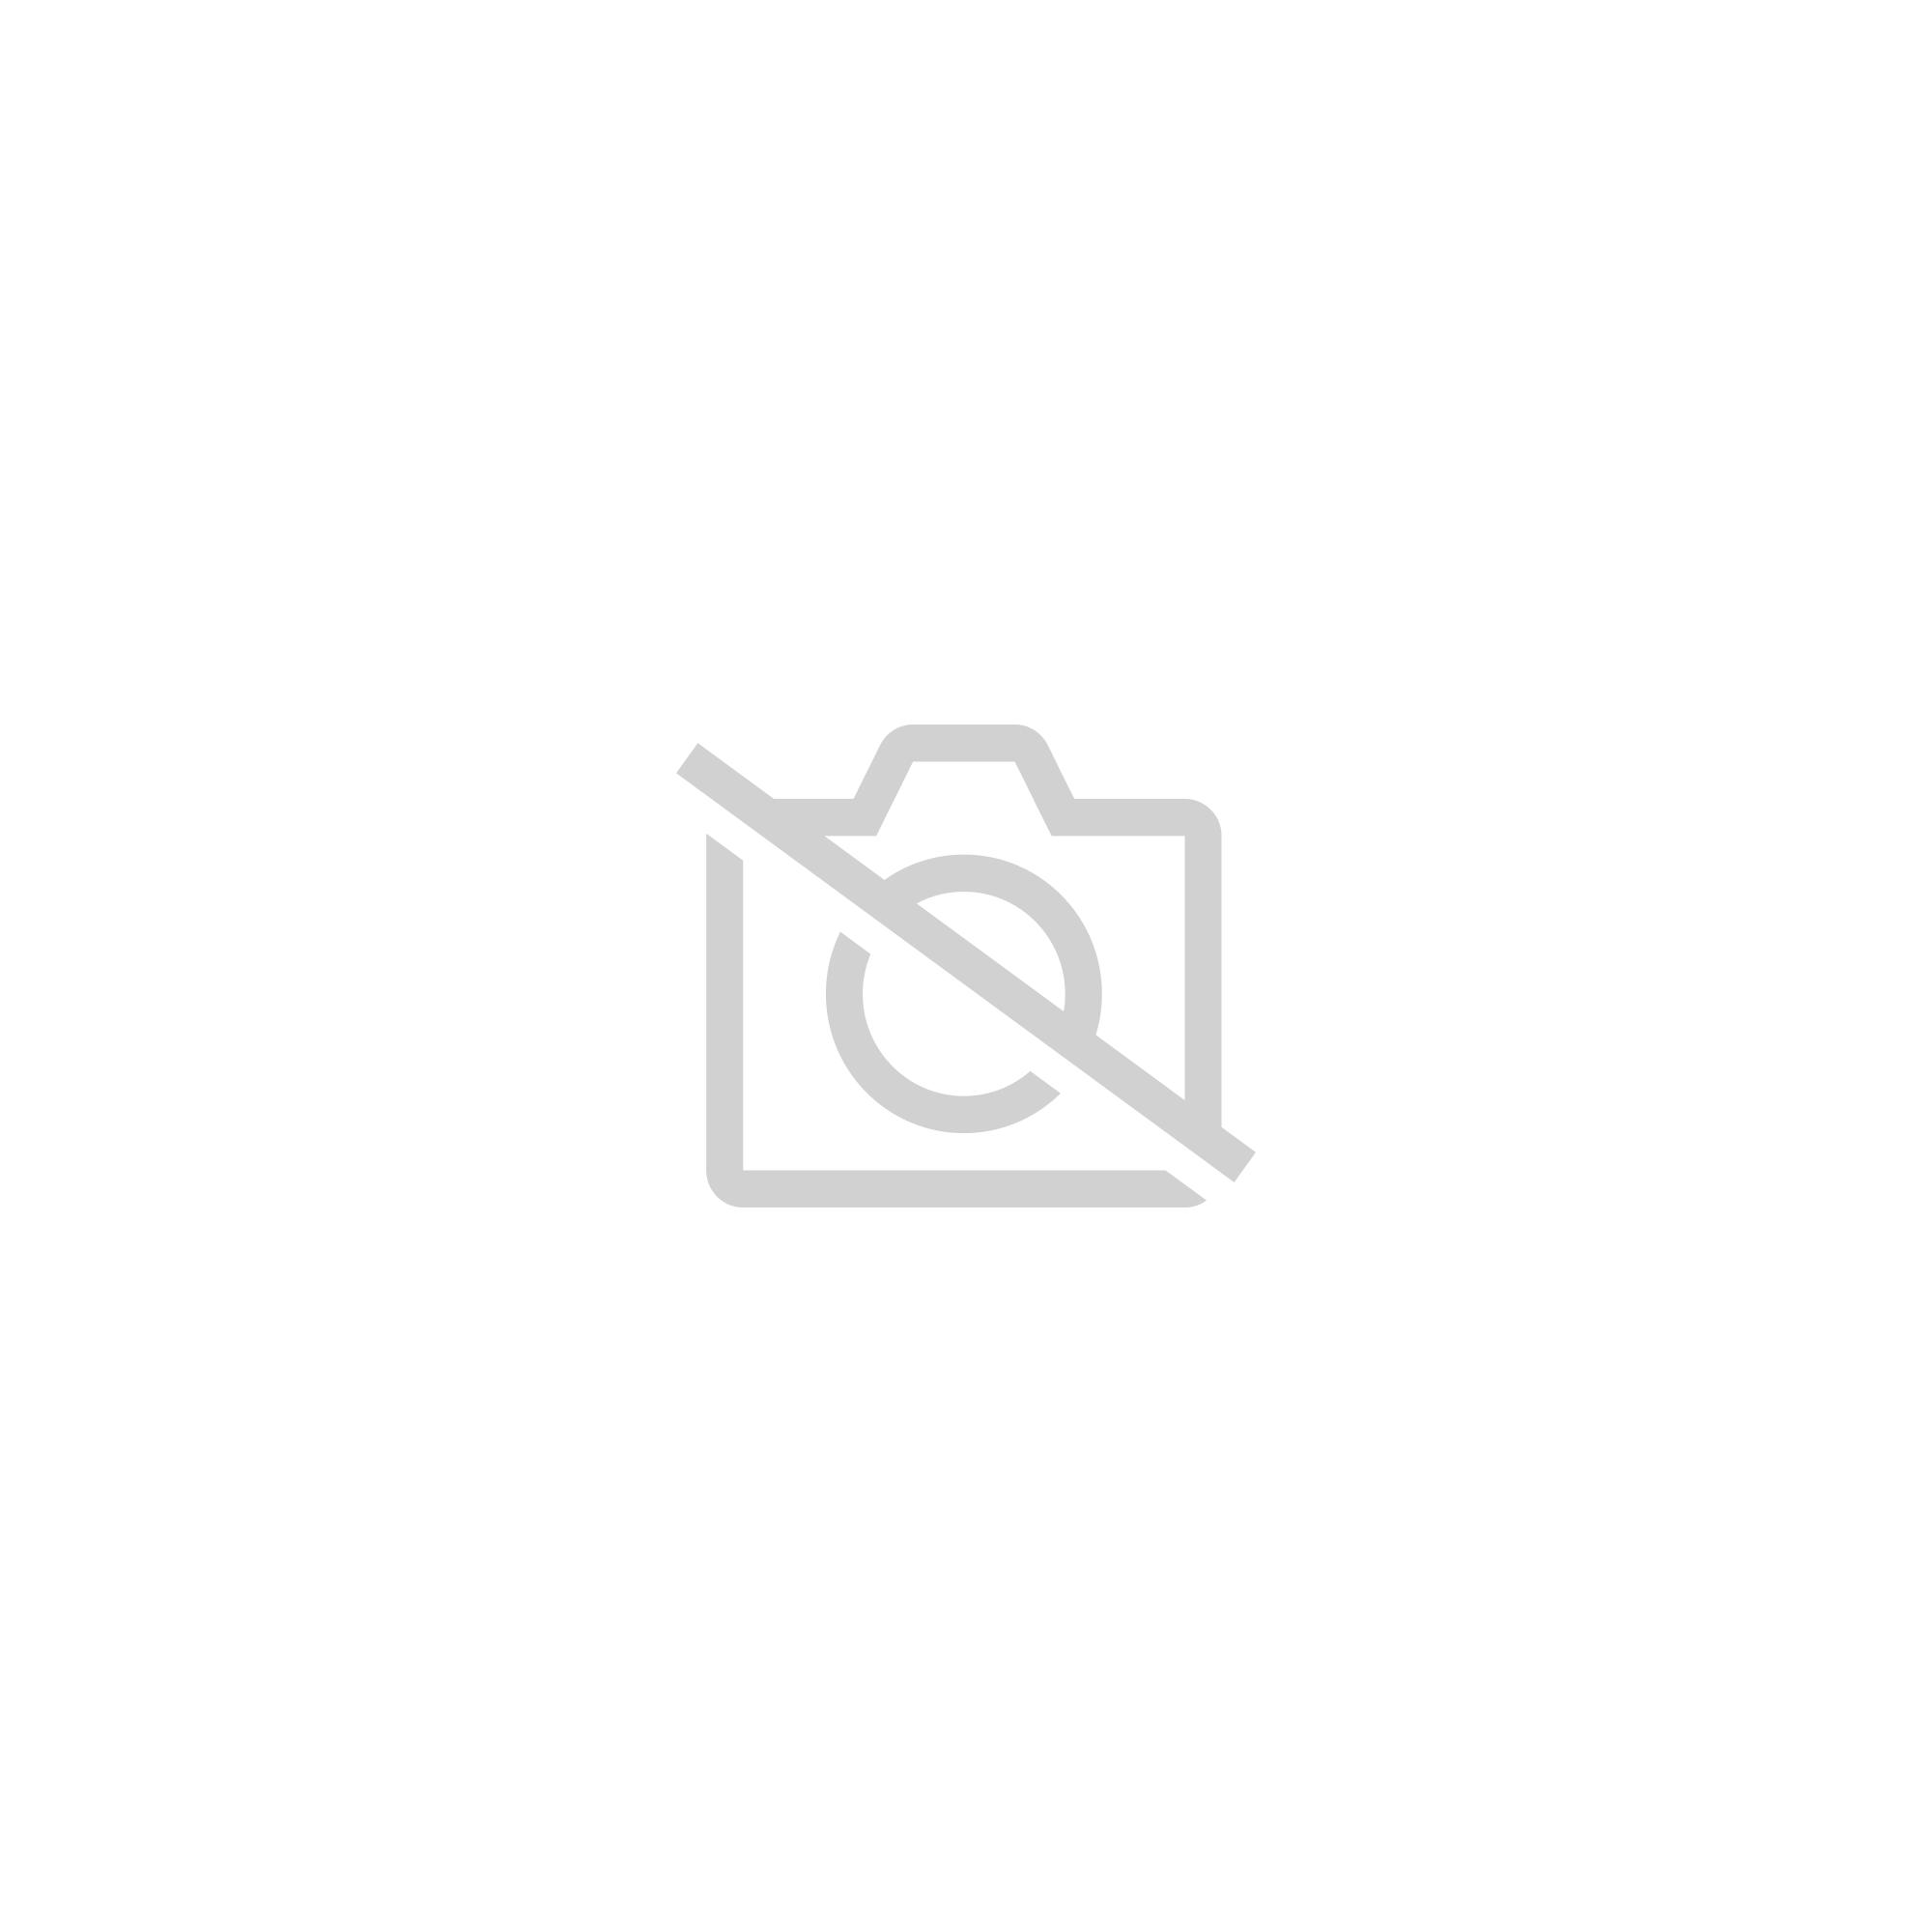 chauffage ventilateur pas cher achat vente rakuten. Black Bedroom Furniture Sets. Home Design Ideas